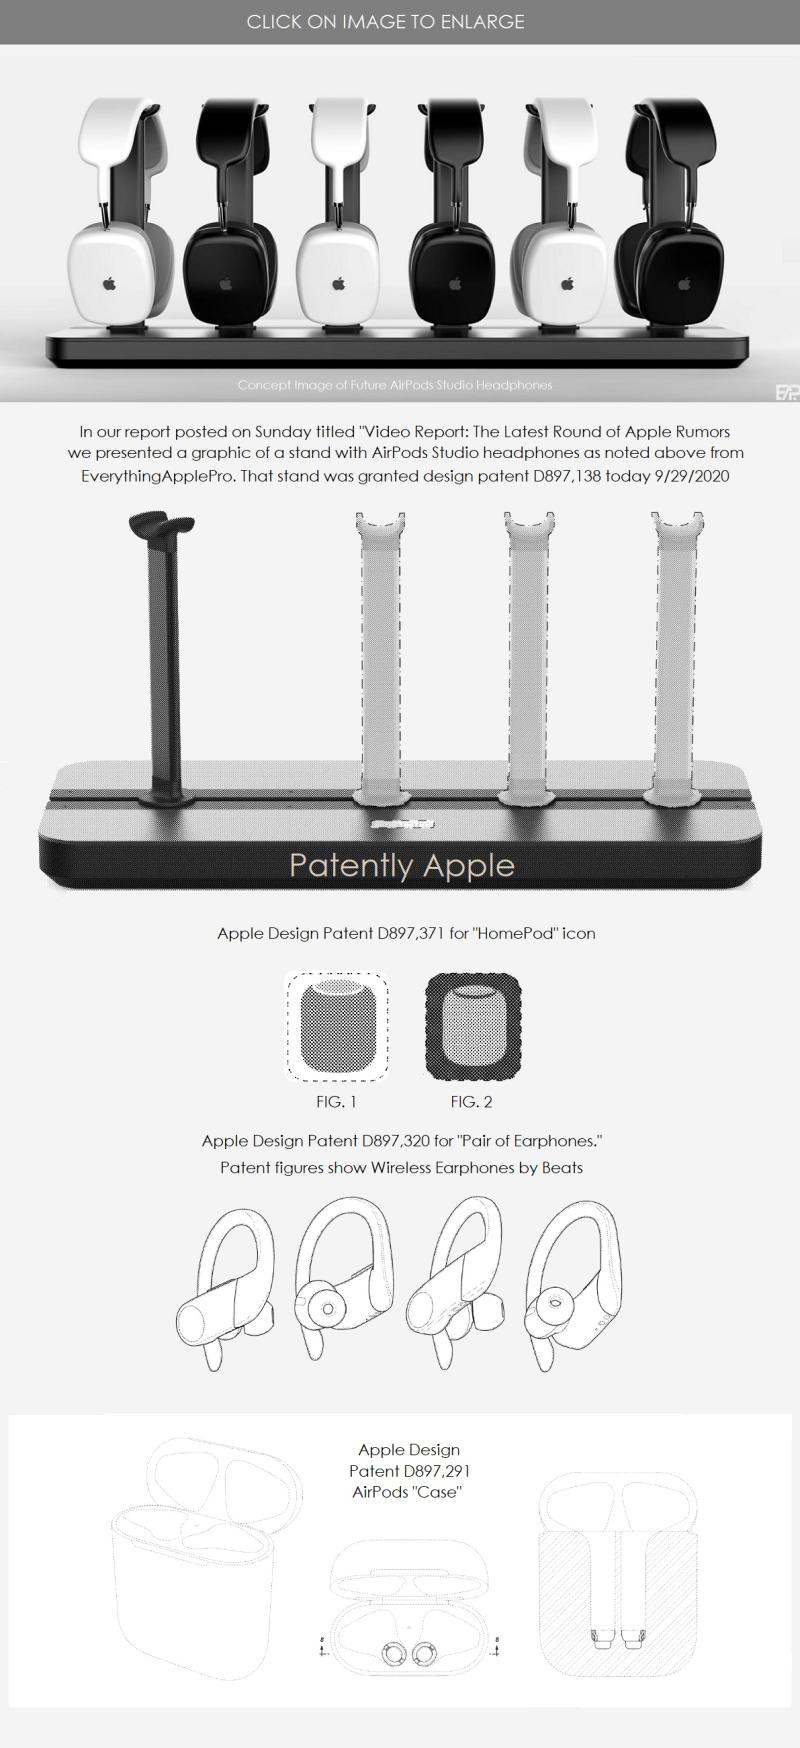 5. Apple Design Patents for sept 29  2020